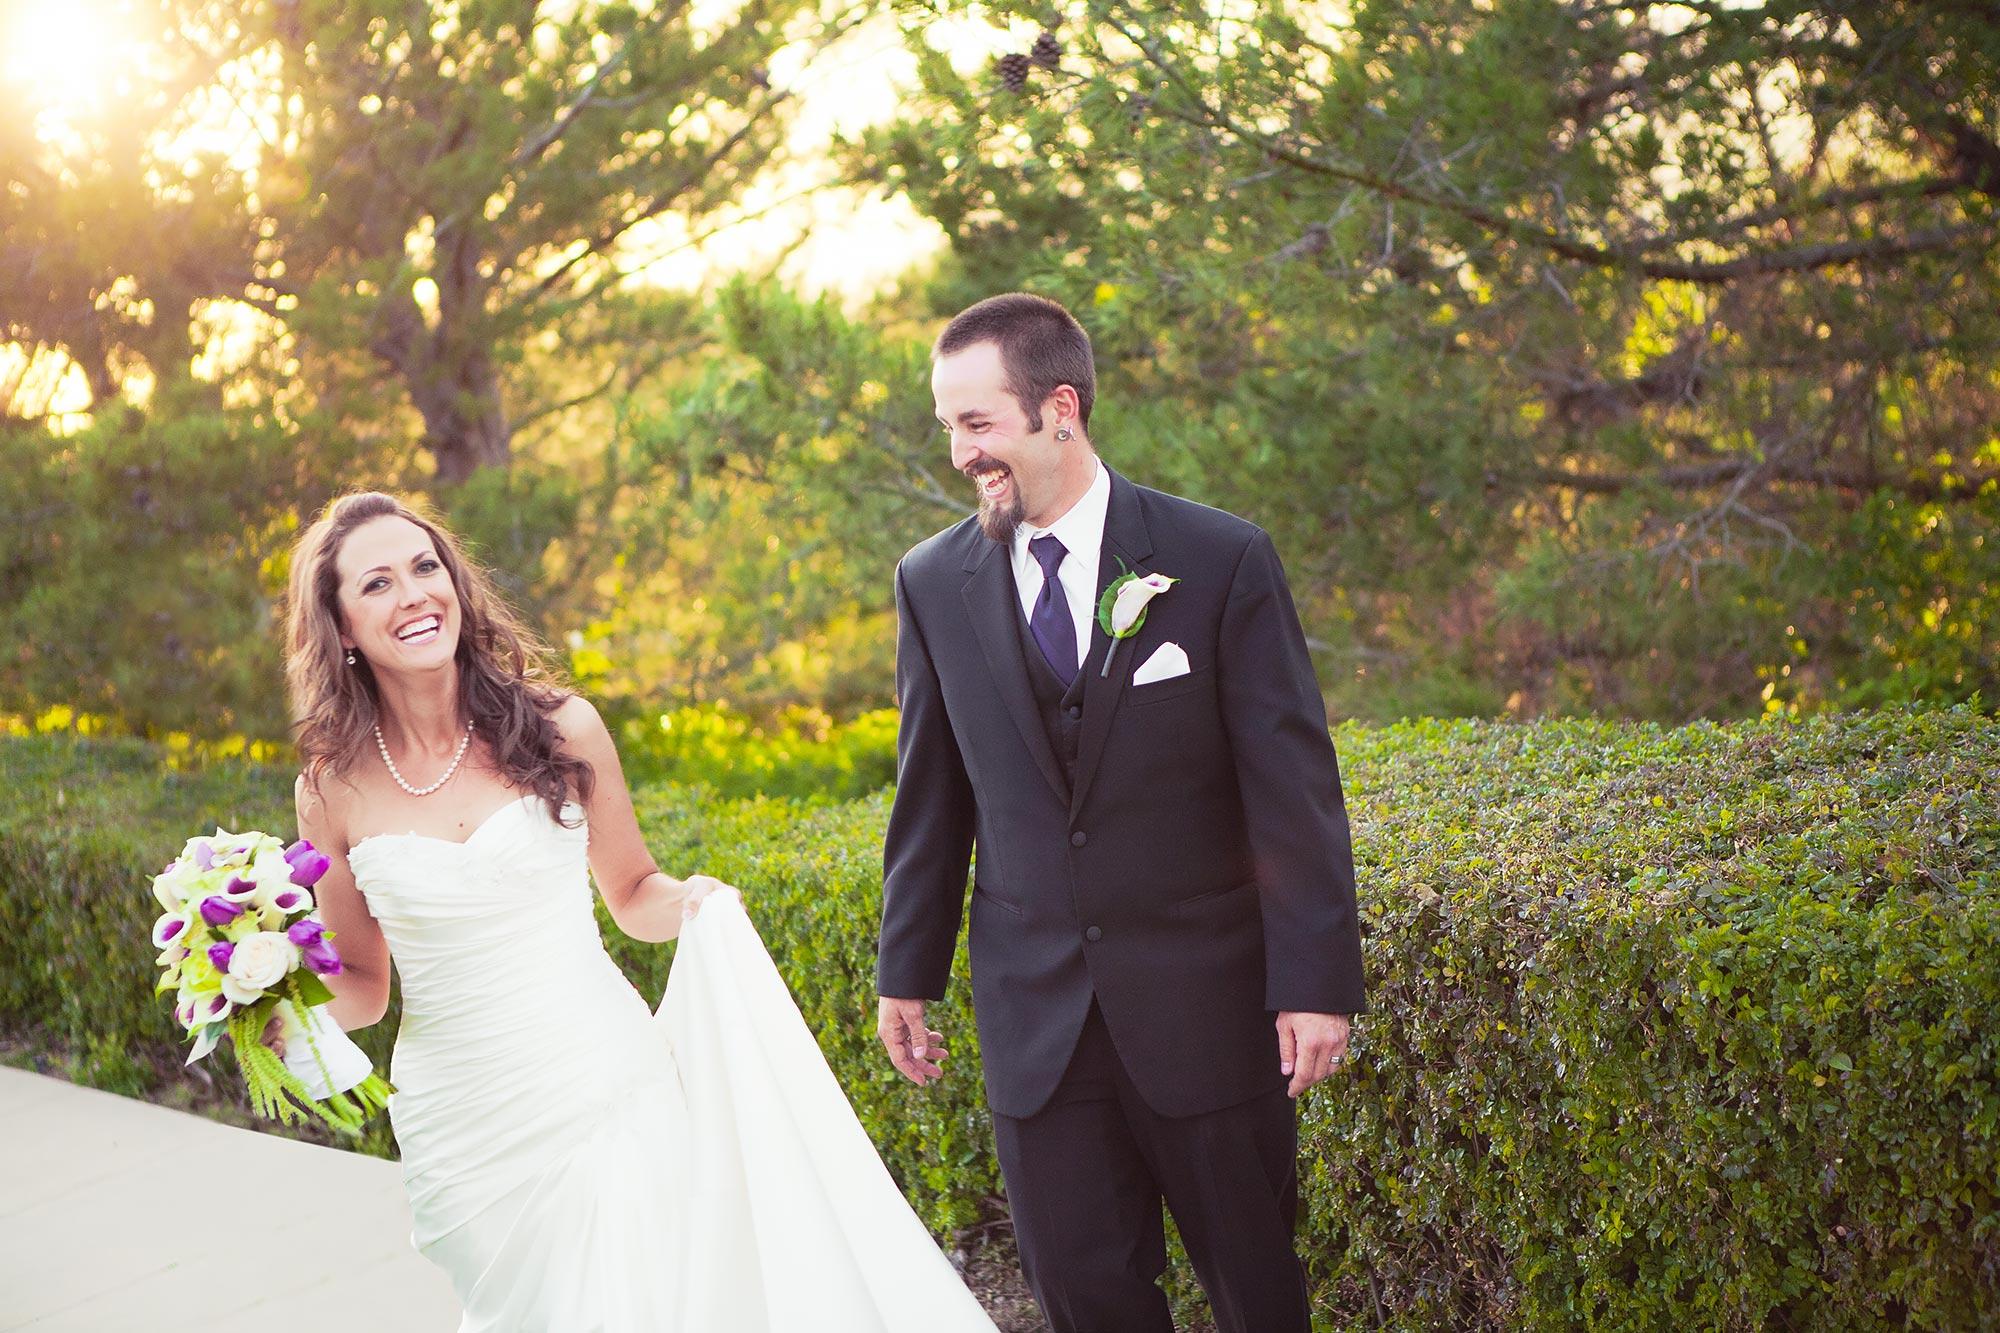 Greater Boston Wedding Photographer | Stephen Grant Photography